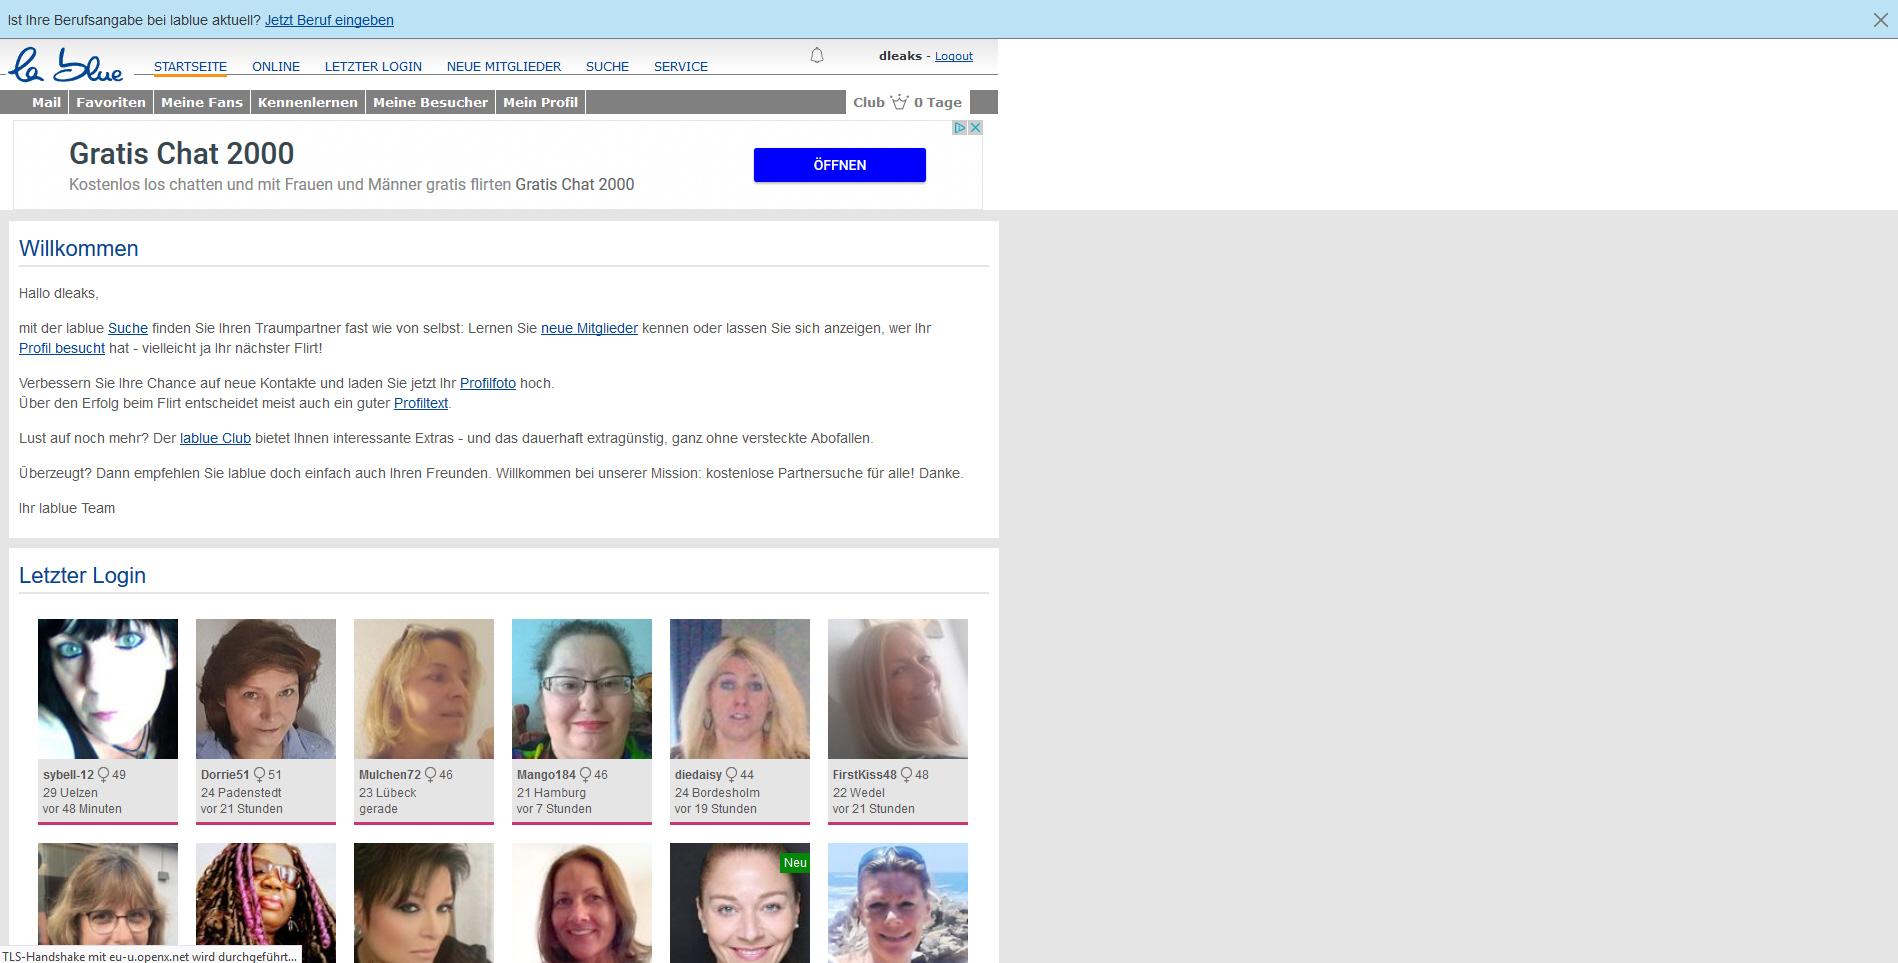 lablue.de - Tests & Erfahrungsberichte - Datingleaks.com